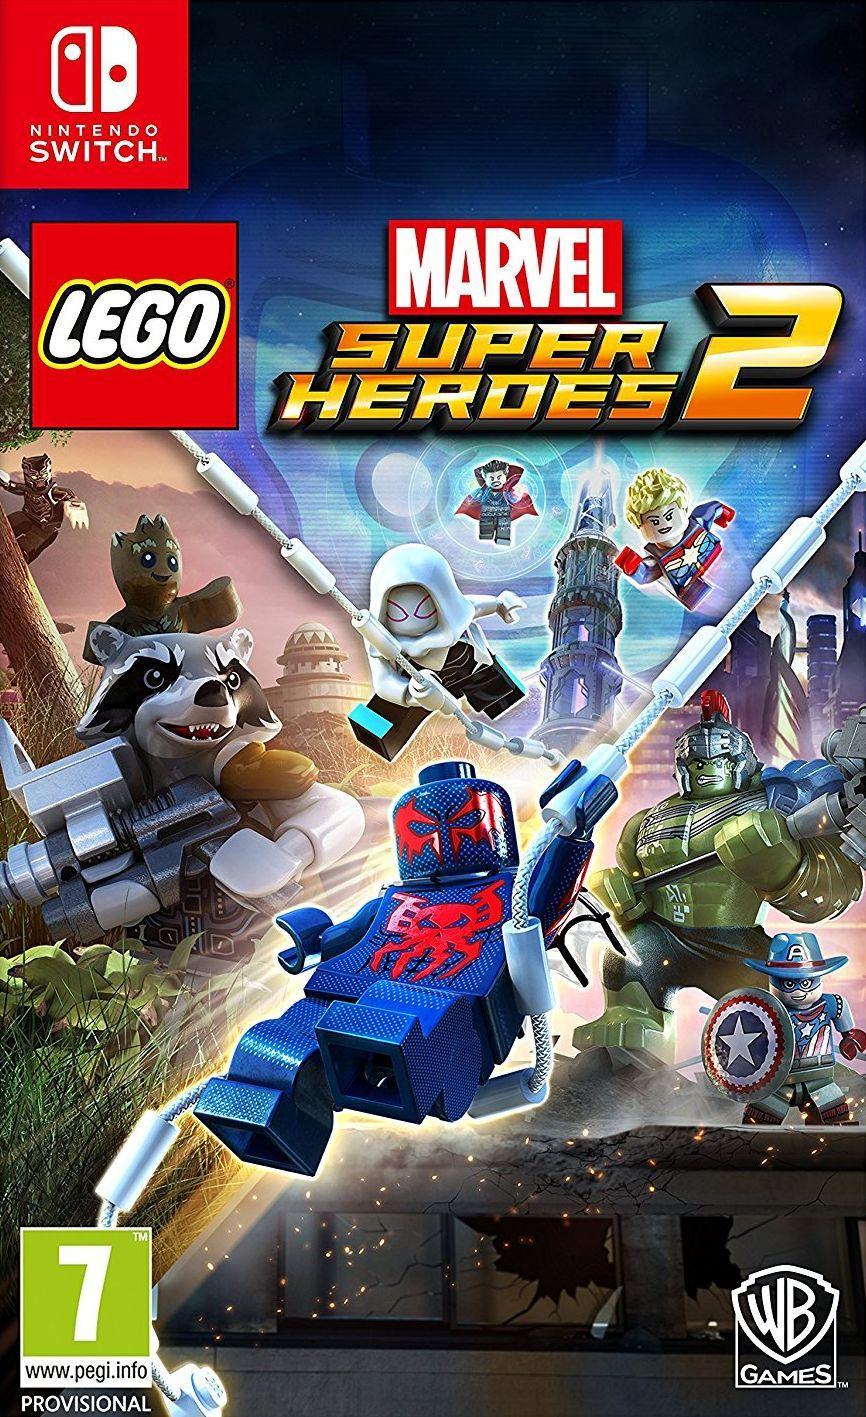 LEGO Marvel Super Heroes 2 (Nintendo Switch) - 1